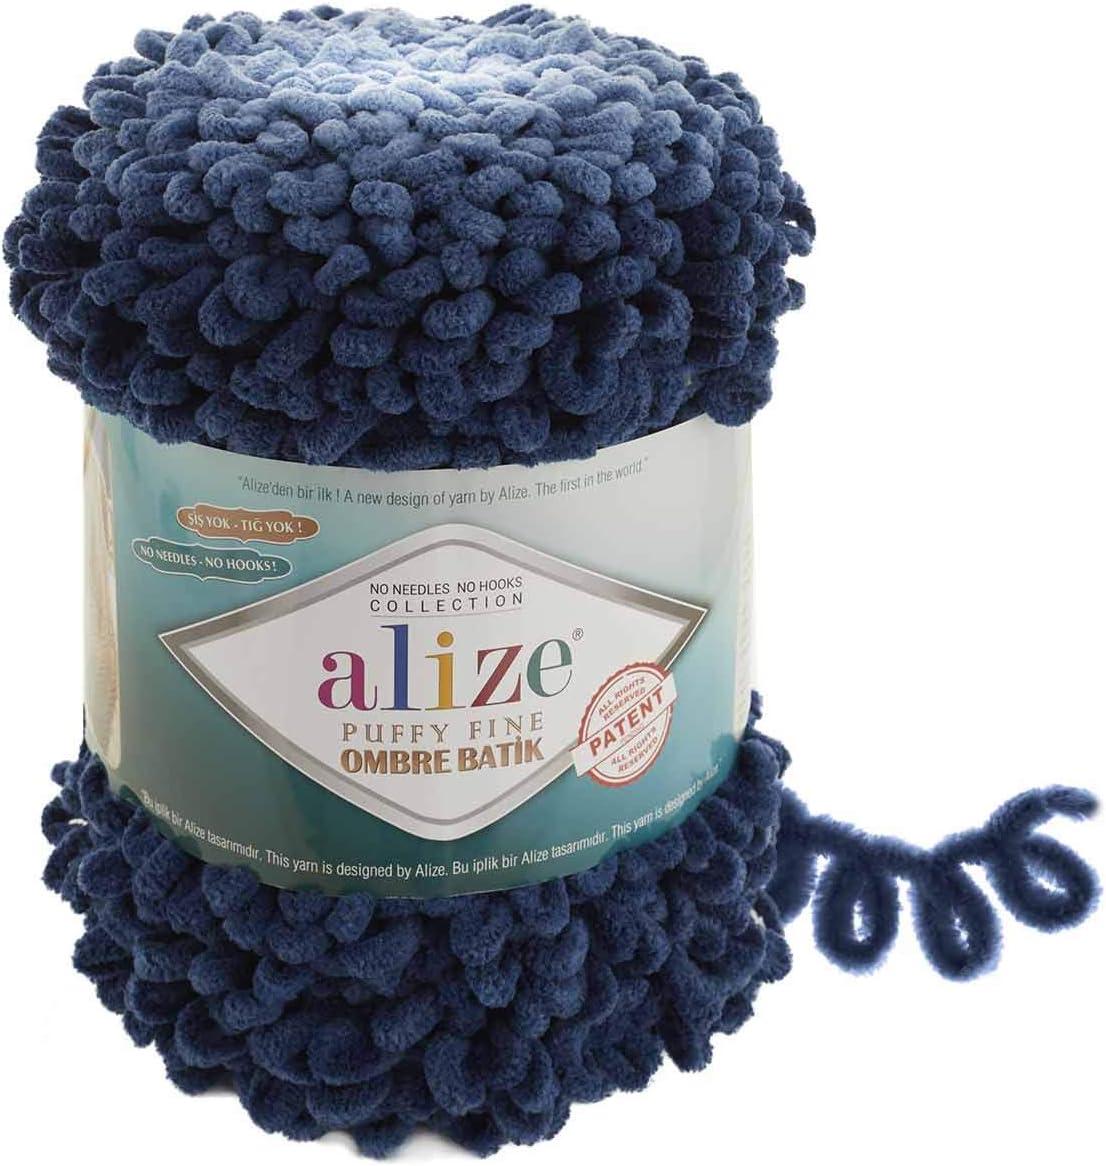 12 skeins Free shipping Alize puffy fine No neddle,Puffy Yarn No hook Velvet yarn Bulky yarn Baby yarn Blanket yarn